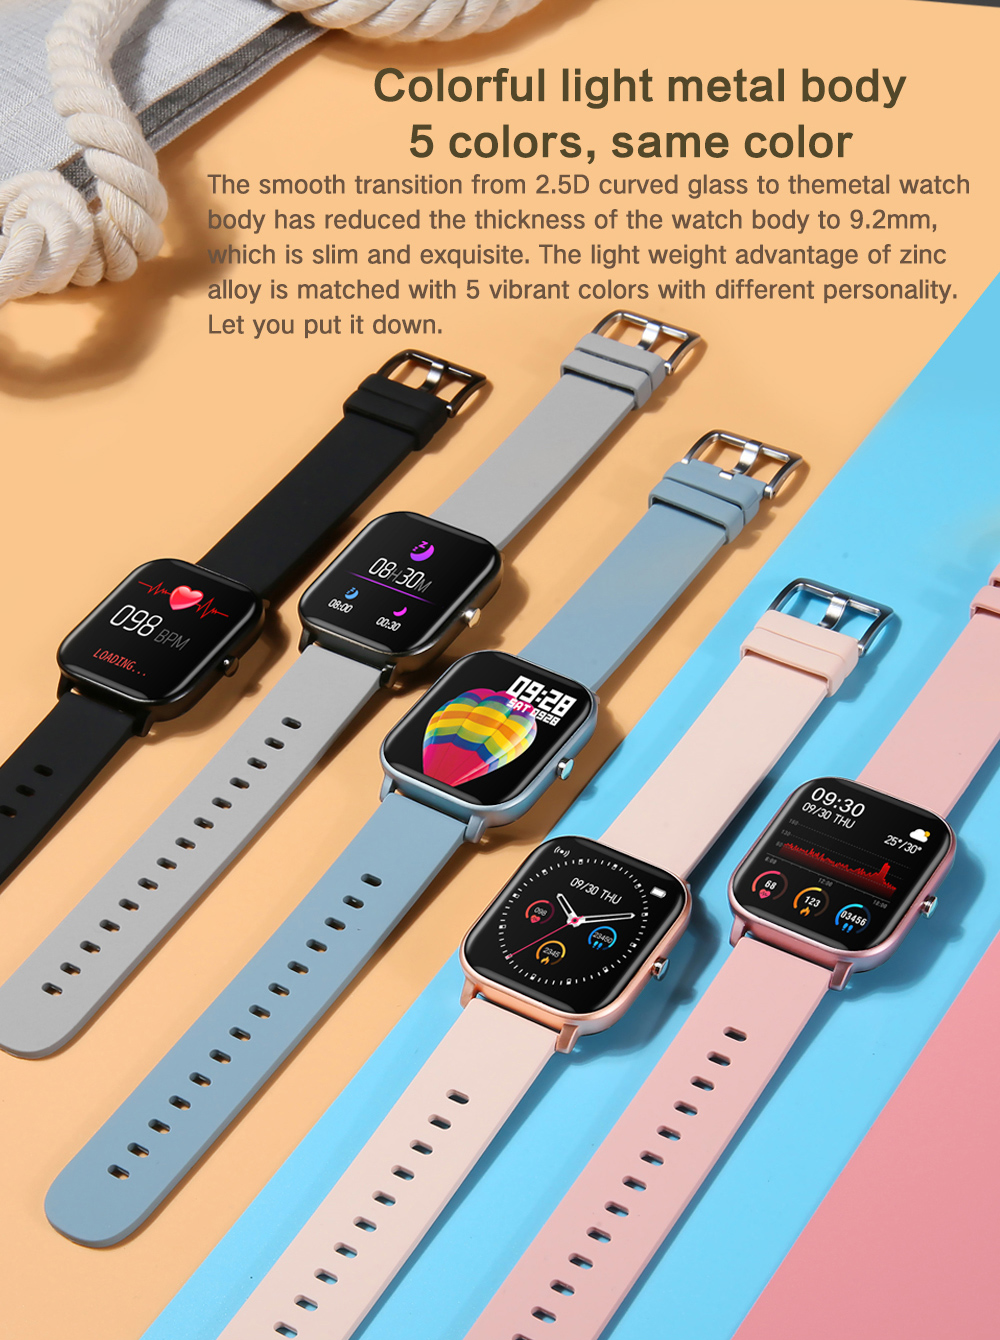 H73ad2689c1084aee8da729193fad40f7d 2021 New P8 Color Screen Smart Watch Women men Full Touch Fitness Tracker Blood Pressure Smart Clock Women Smartwatch for Xiaomi